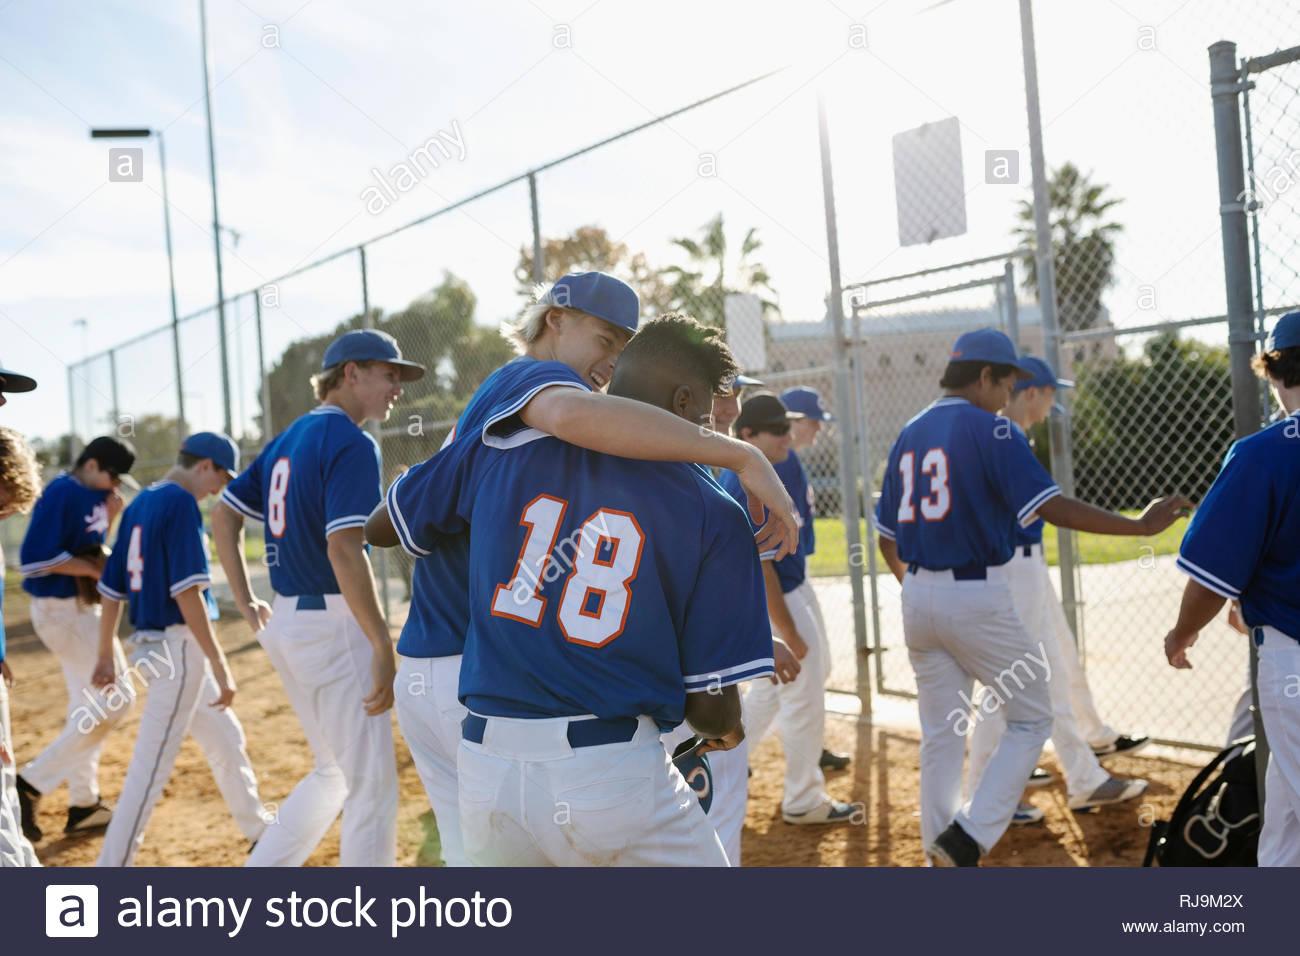 Happy baseball players hugging, walking off sunny field - Stock Image